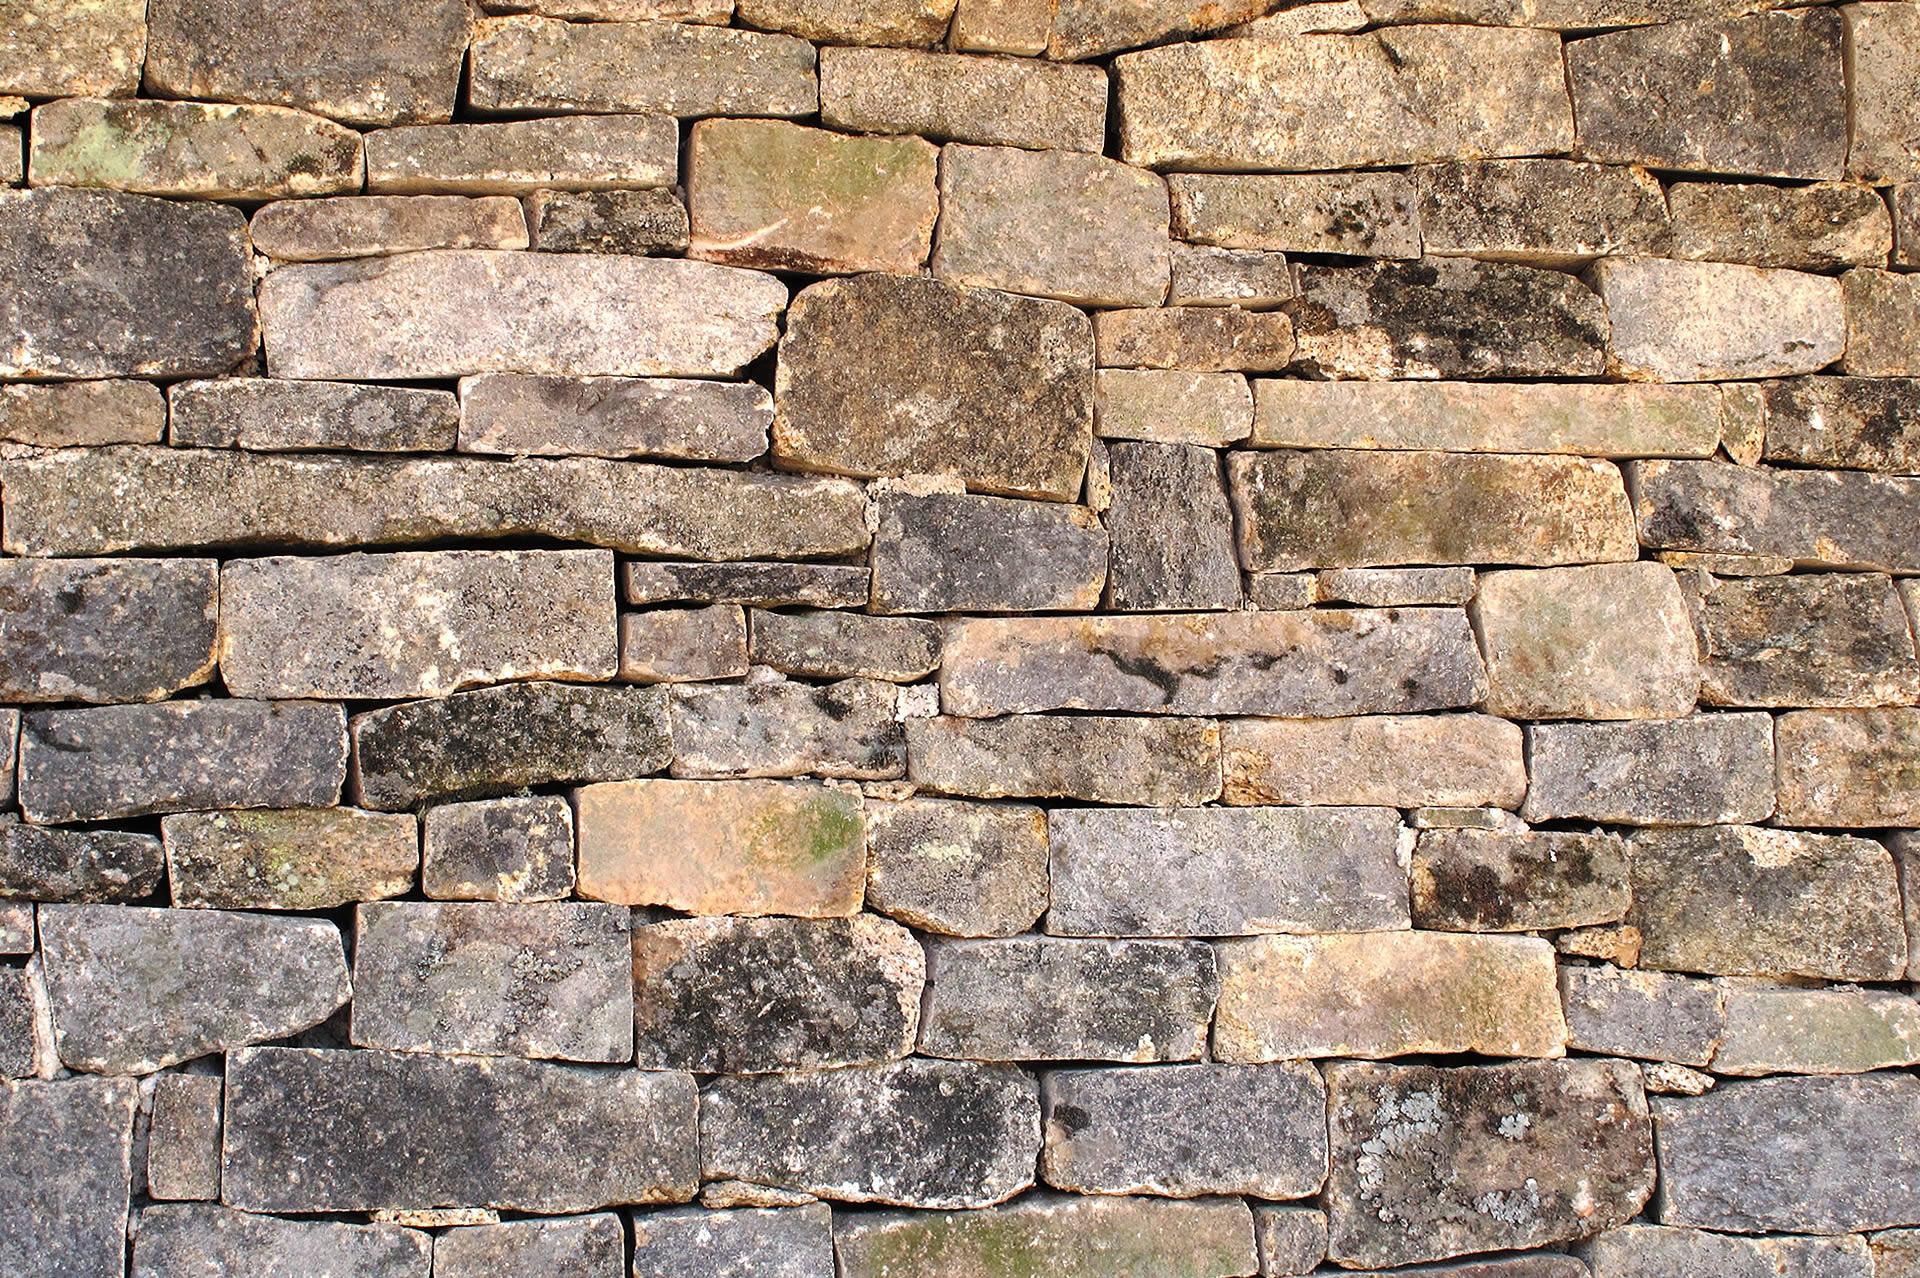 Muro de piedra vieja junta seca arteroca - Muros de piedra ...